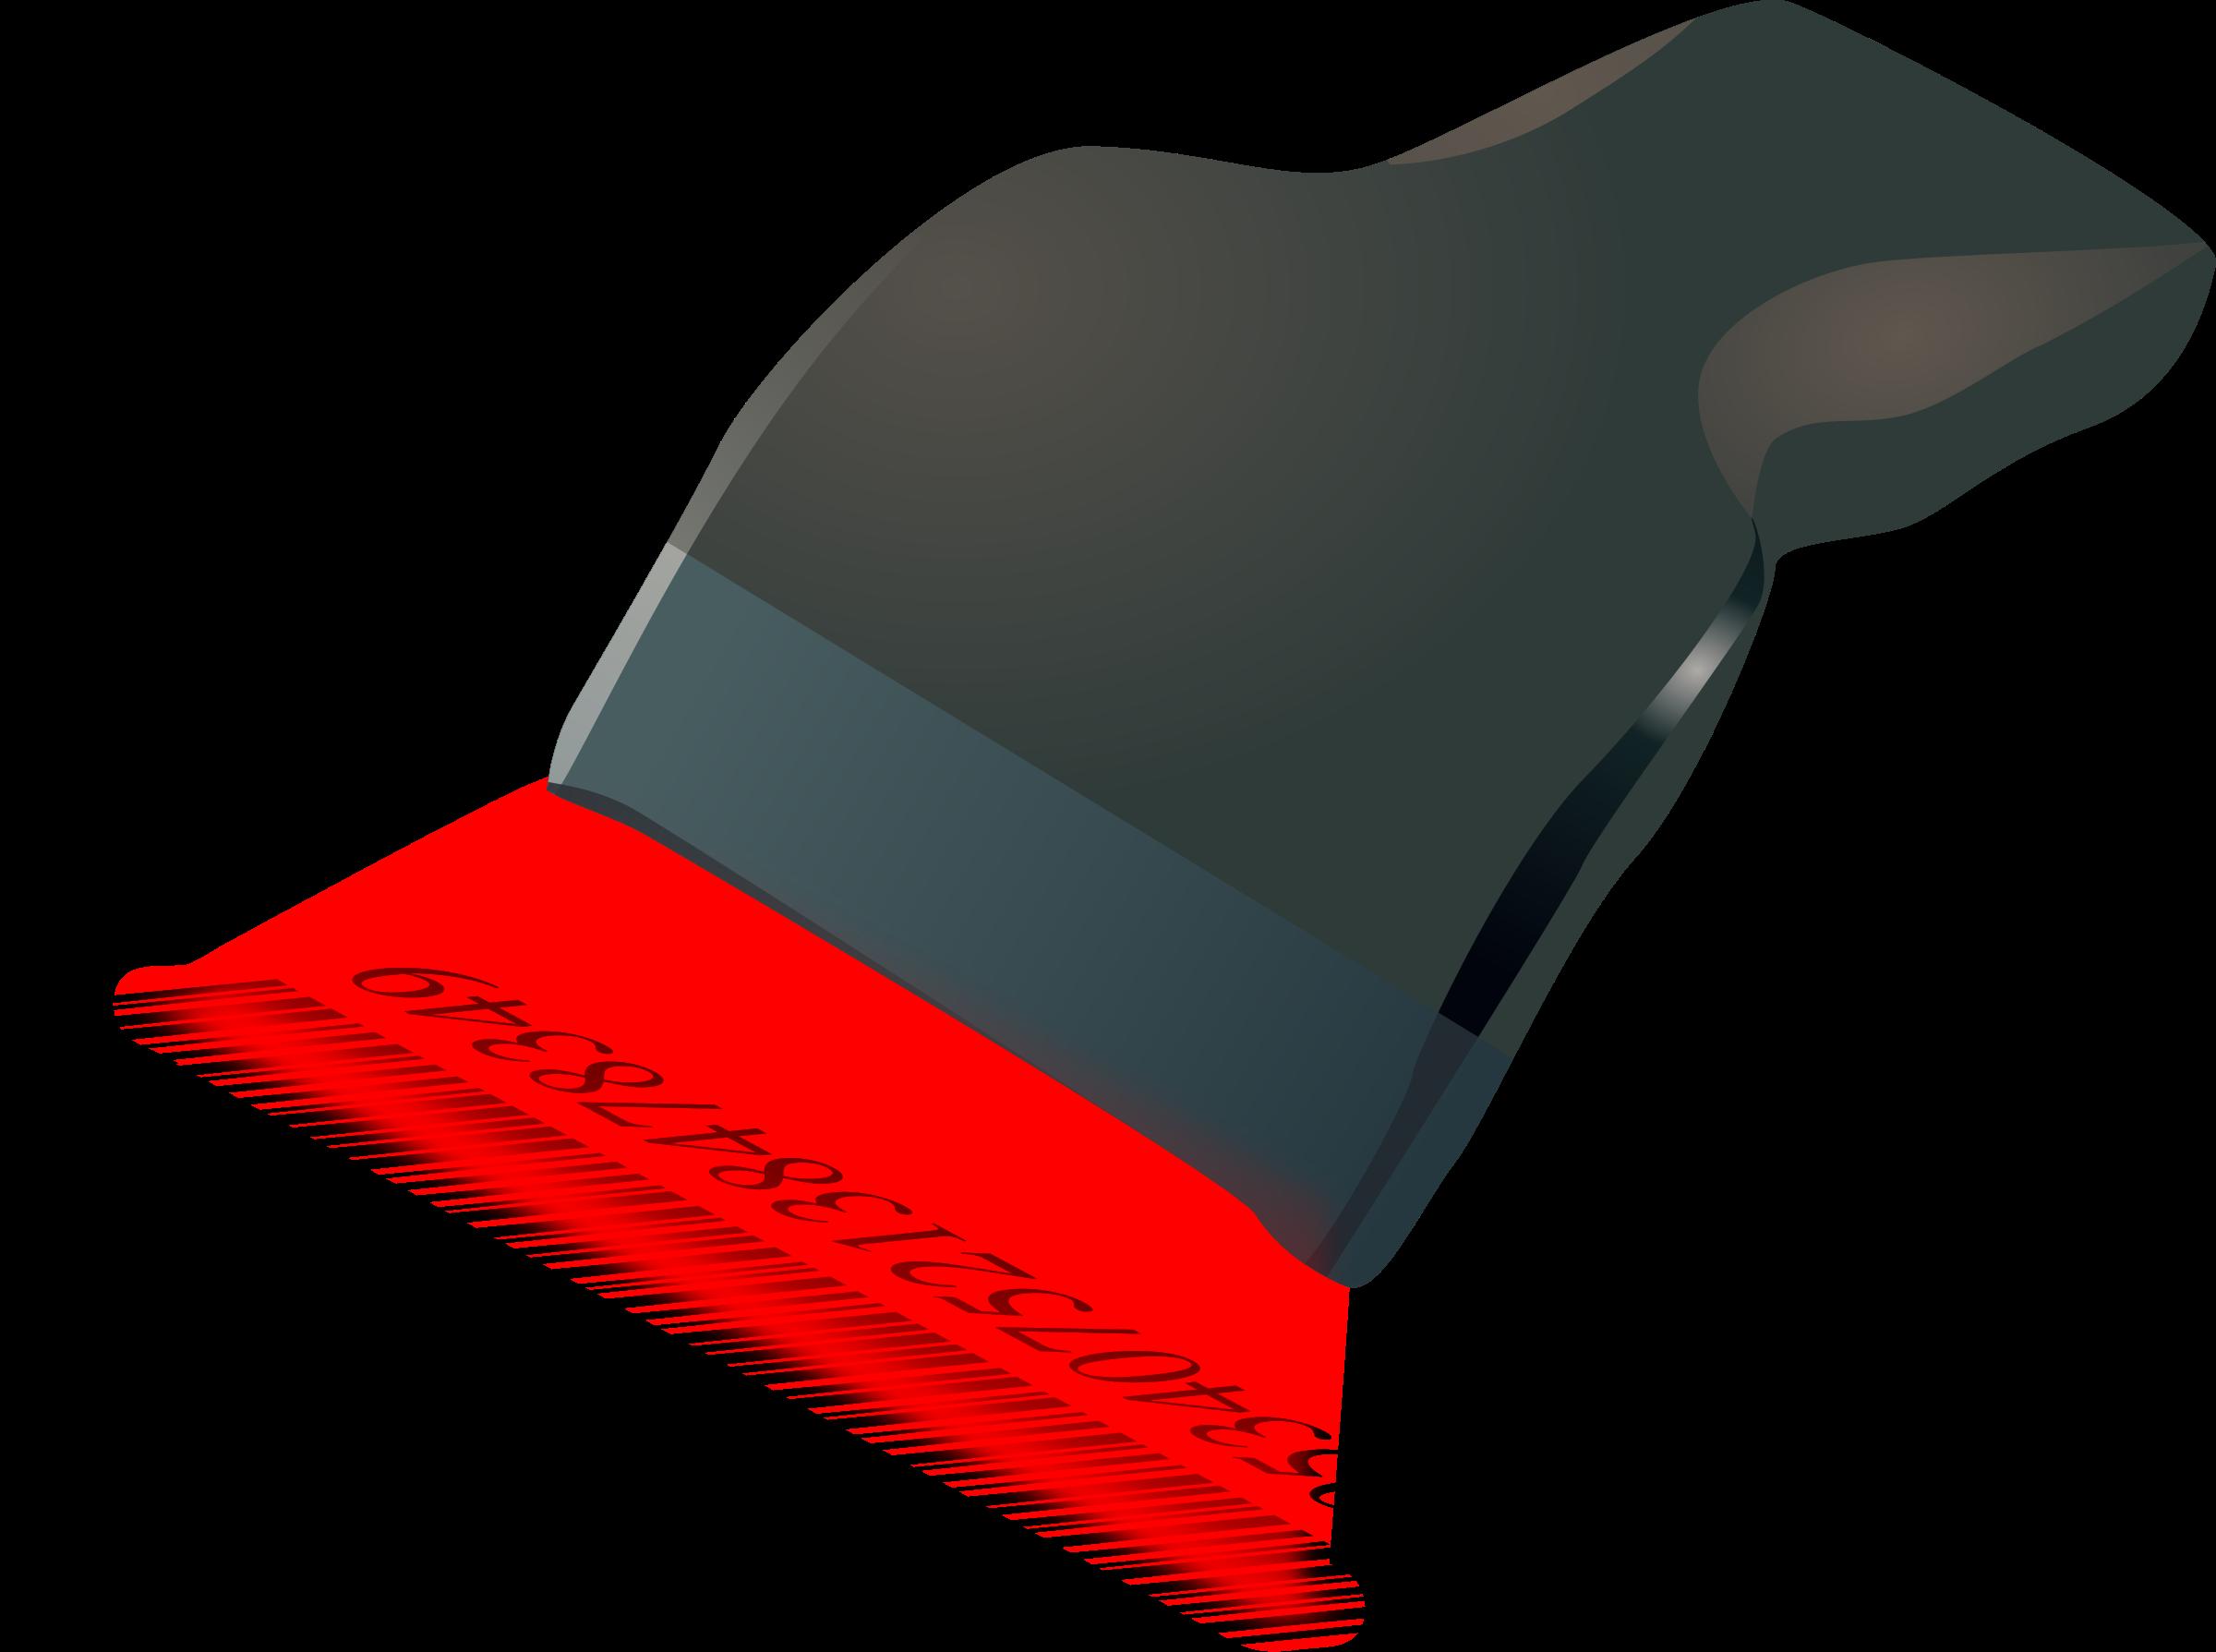 Barcode clipart barcode scanner Barcode barcode scanner Barcode barcode